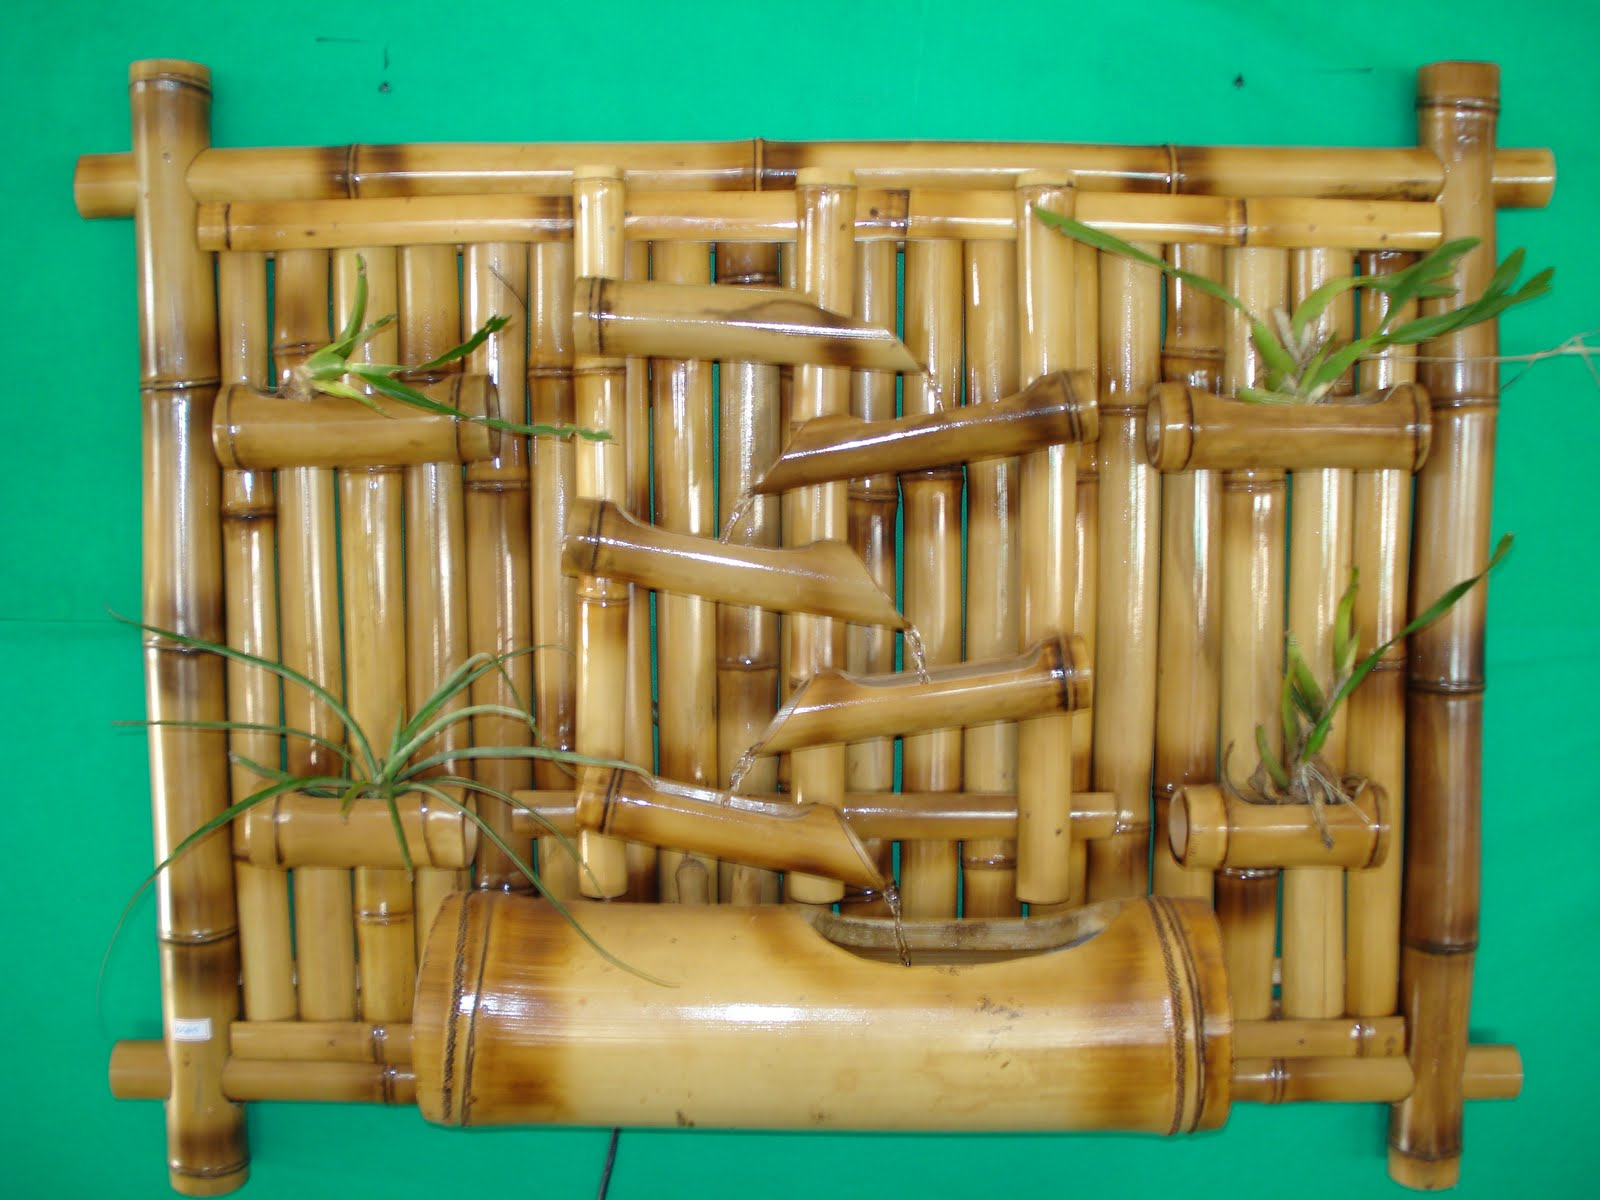 artesanato de bambu para jardim : artesanato de bambu para jardim:Habitat Natural Shopping: Artesanatos de Bambu